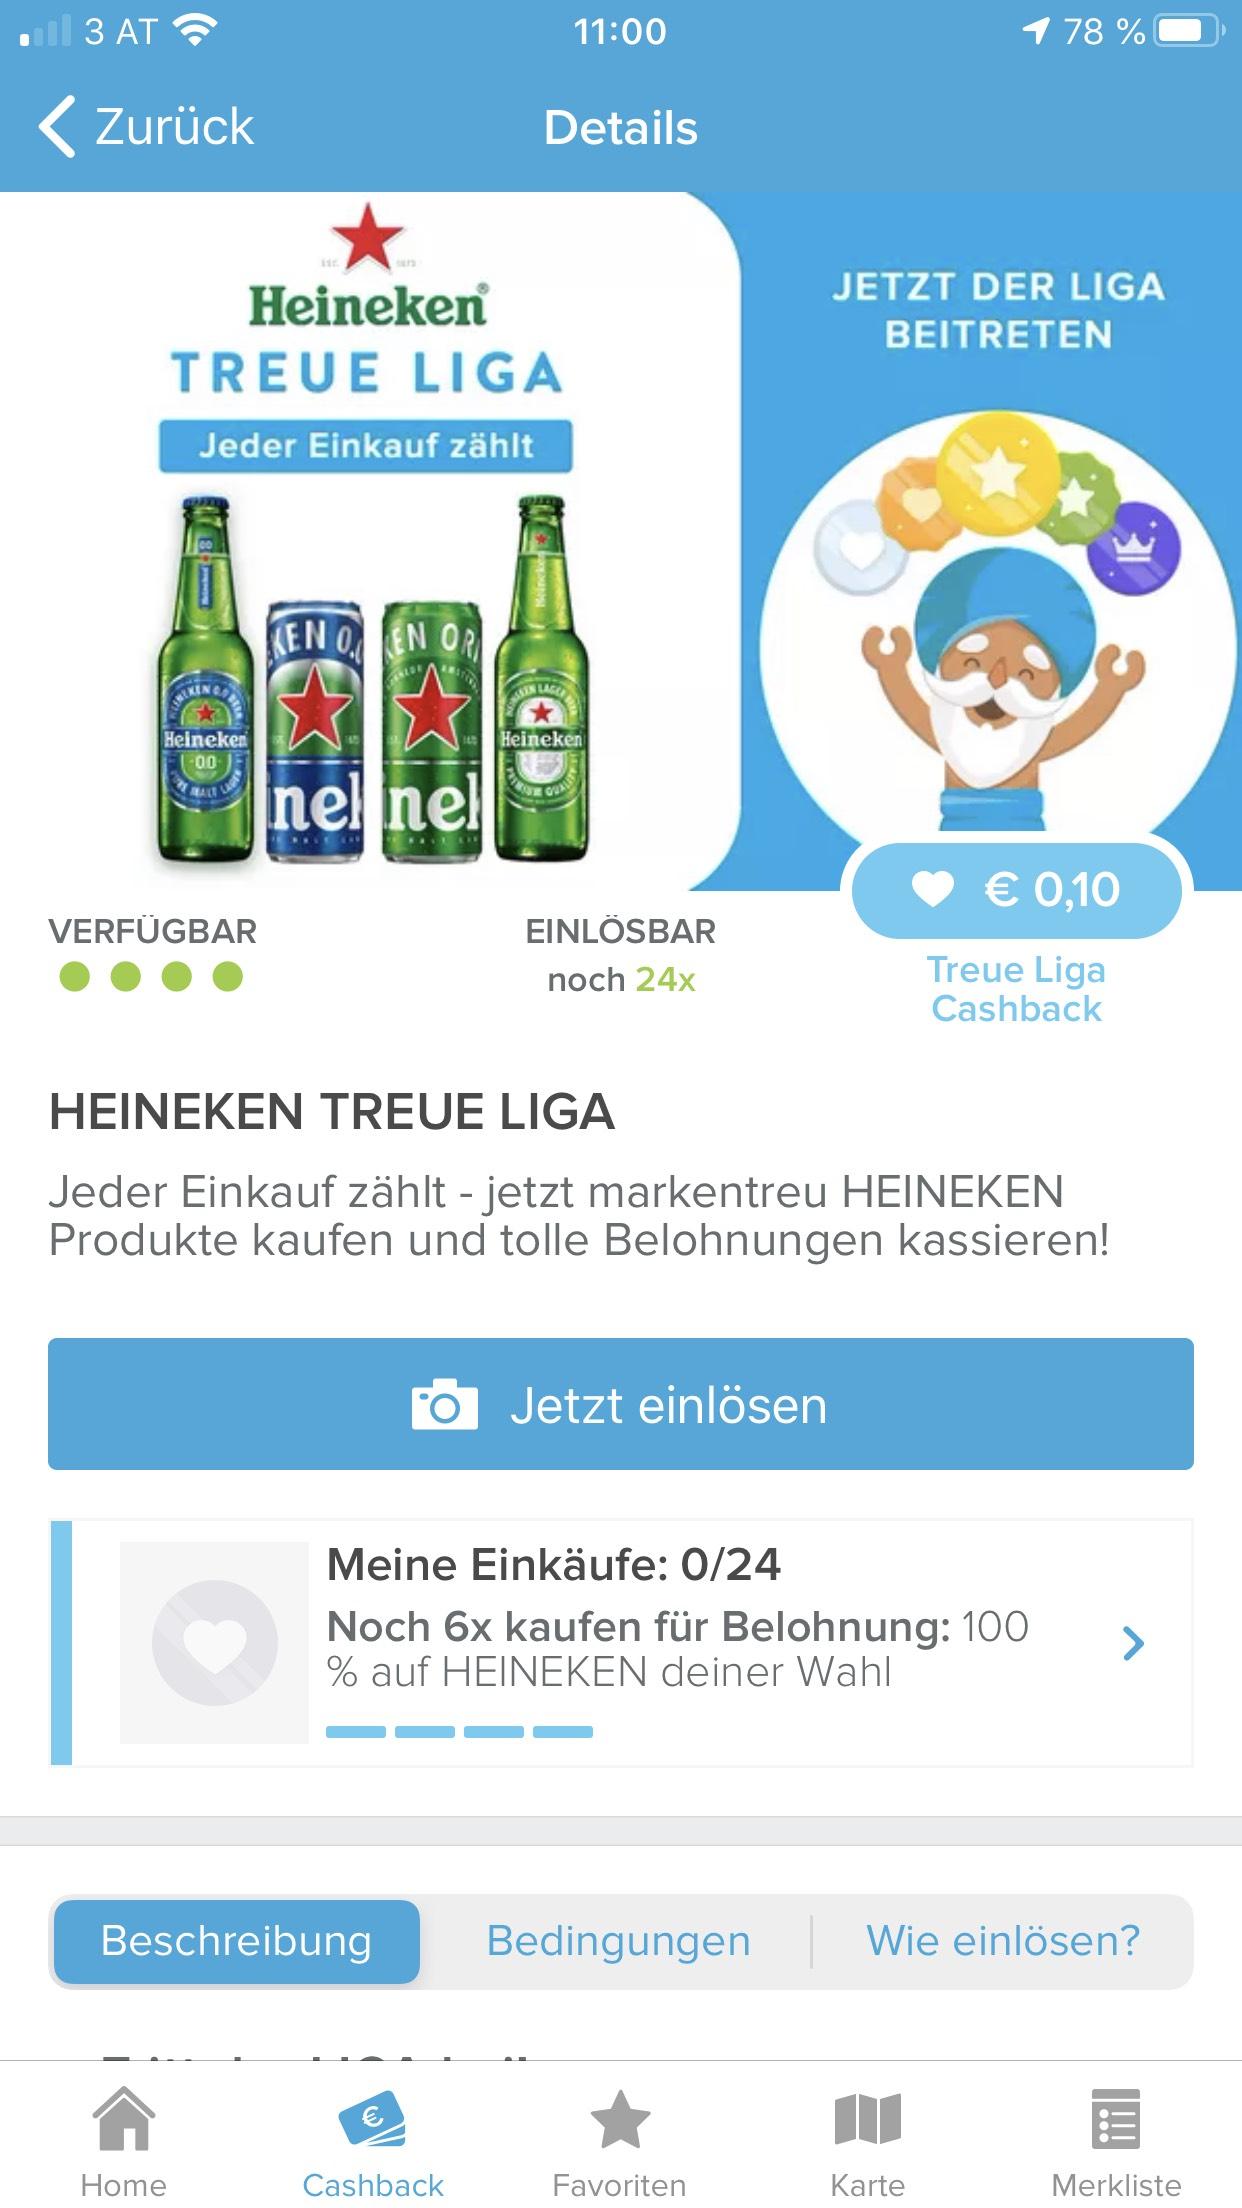 Marktguru Heineken Treue Liga